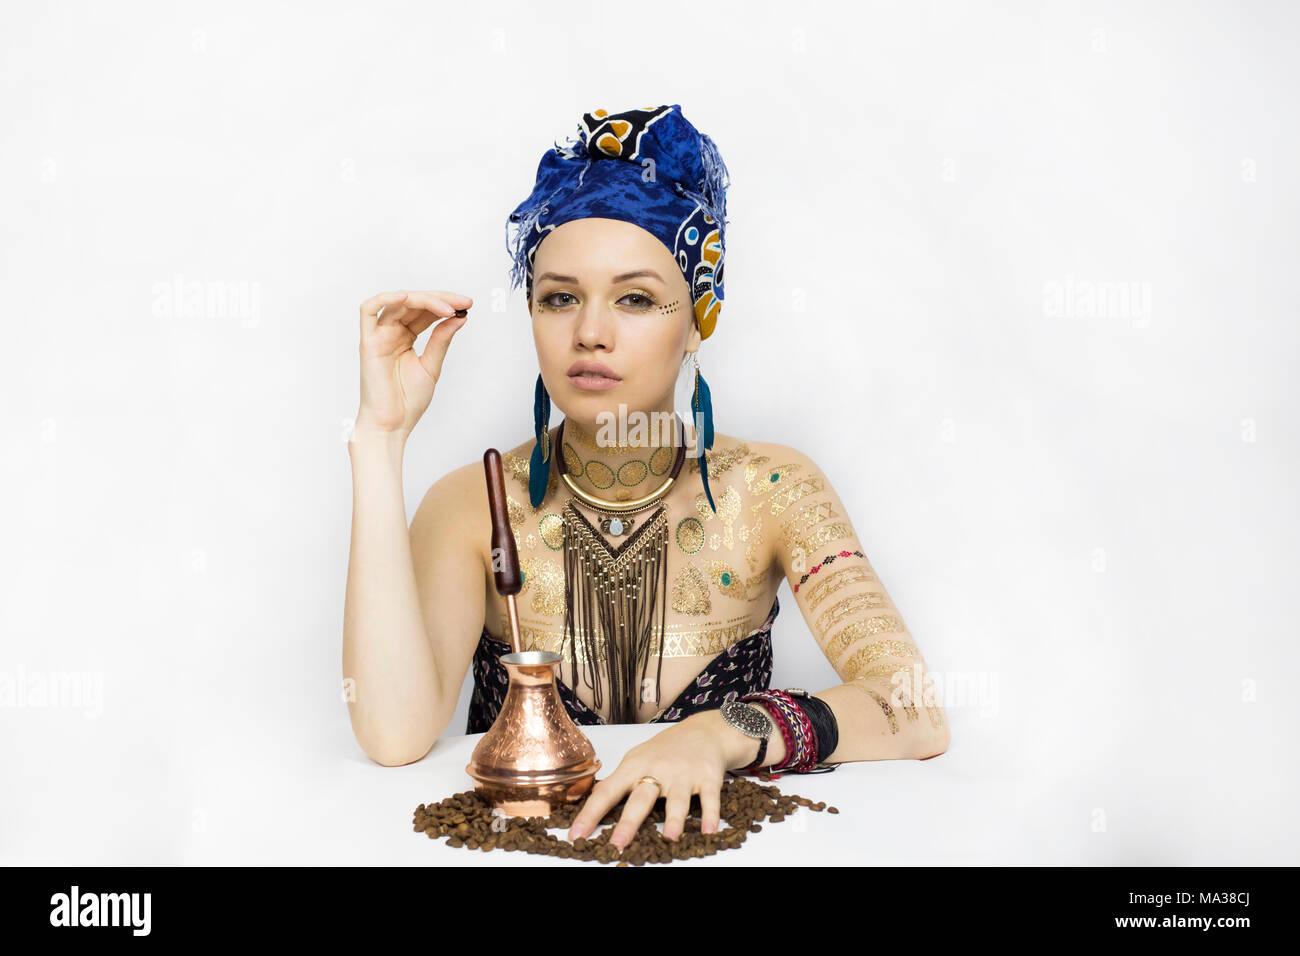 33b23f4cd6dc Una ragazza in Africa e vestiti in stile è in possesso di chicchi di caffè  Immagini